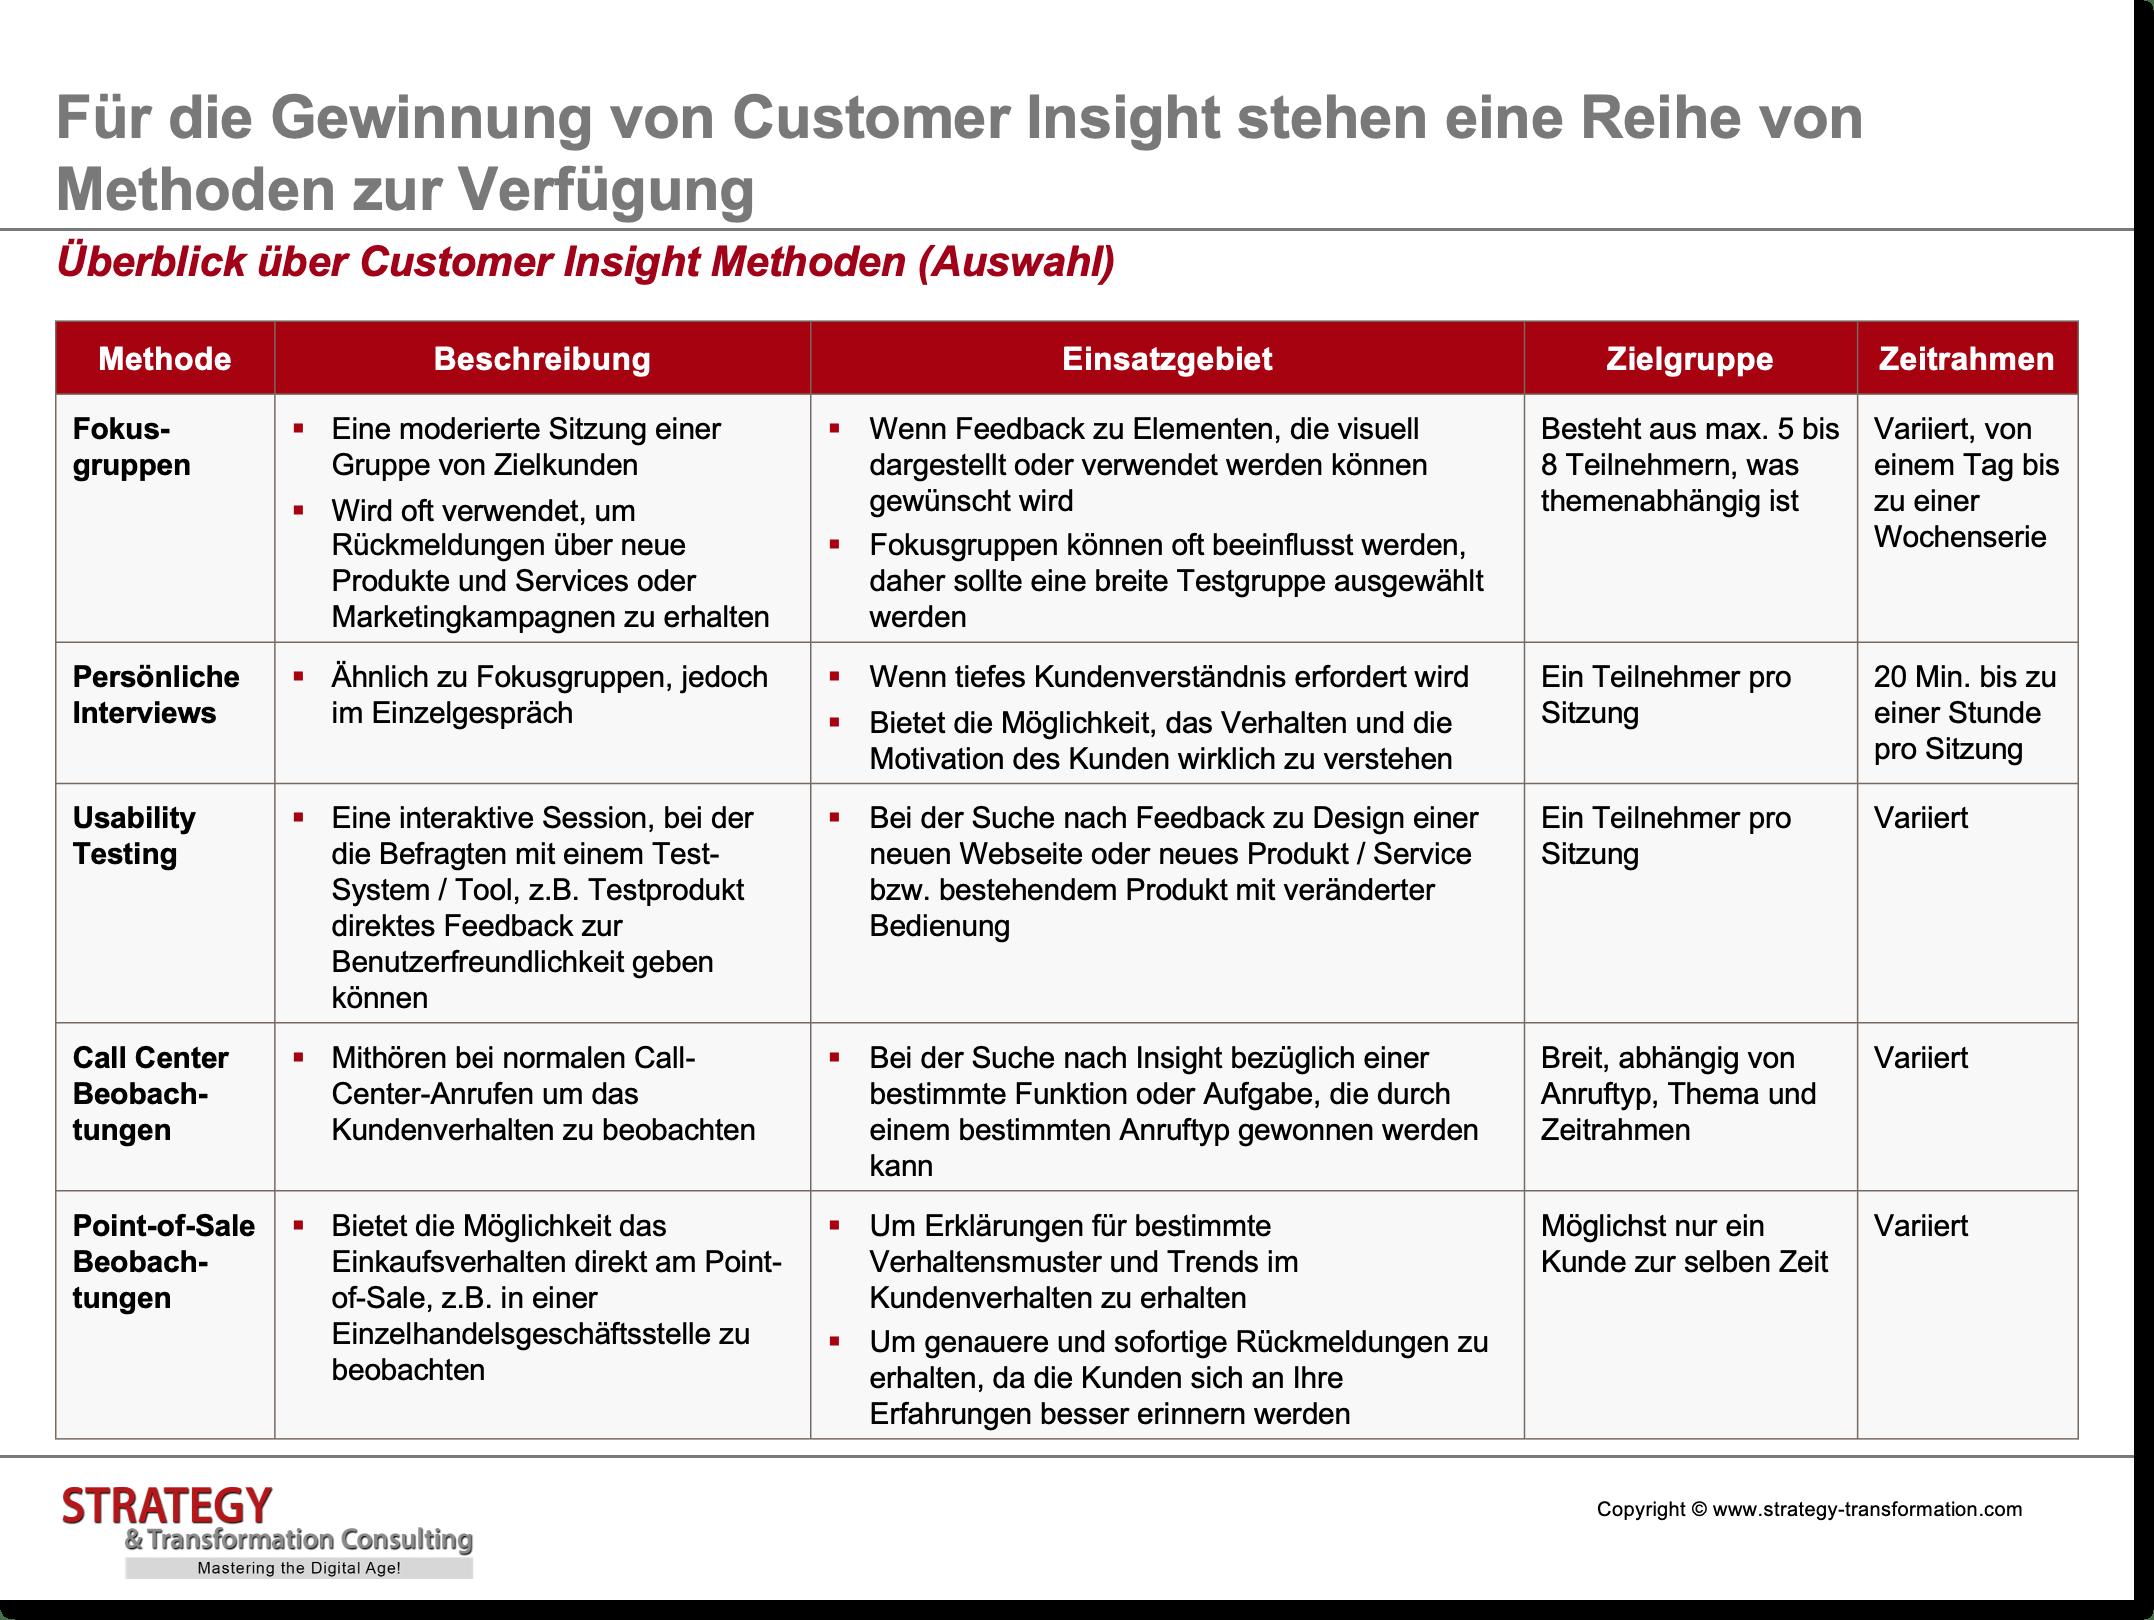 Customer Experience Management_Überblick über Customer Insight Methoden